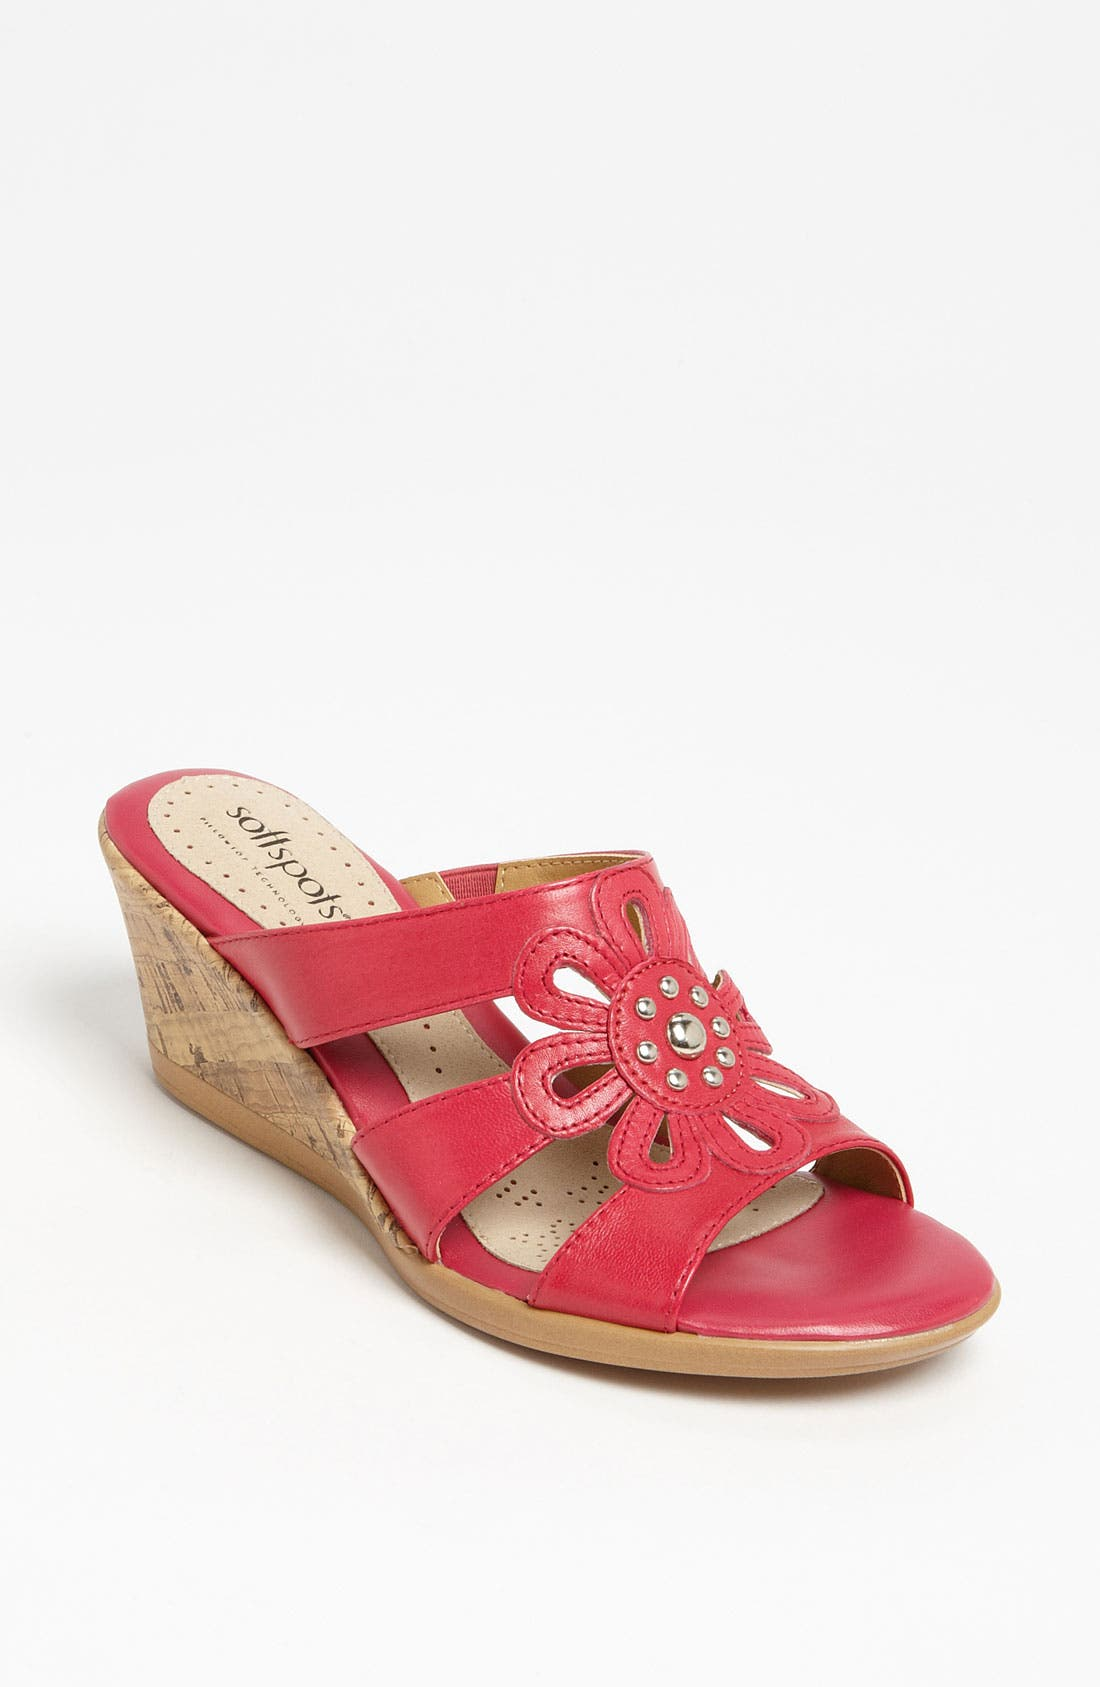 Main Image - Softspots 'Lilianna' Wedge Sandal